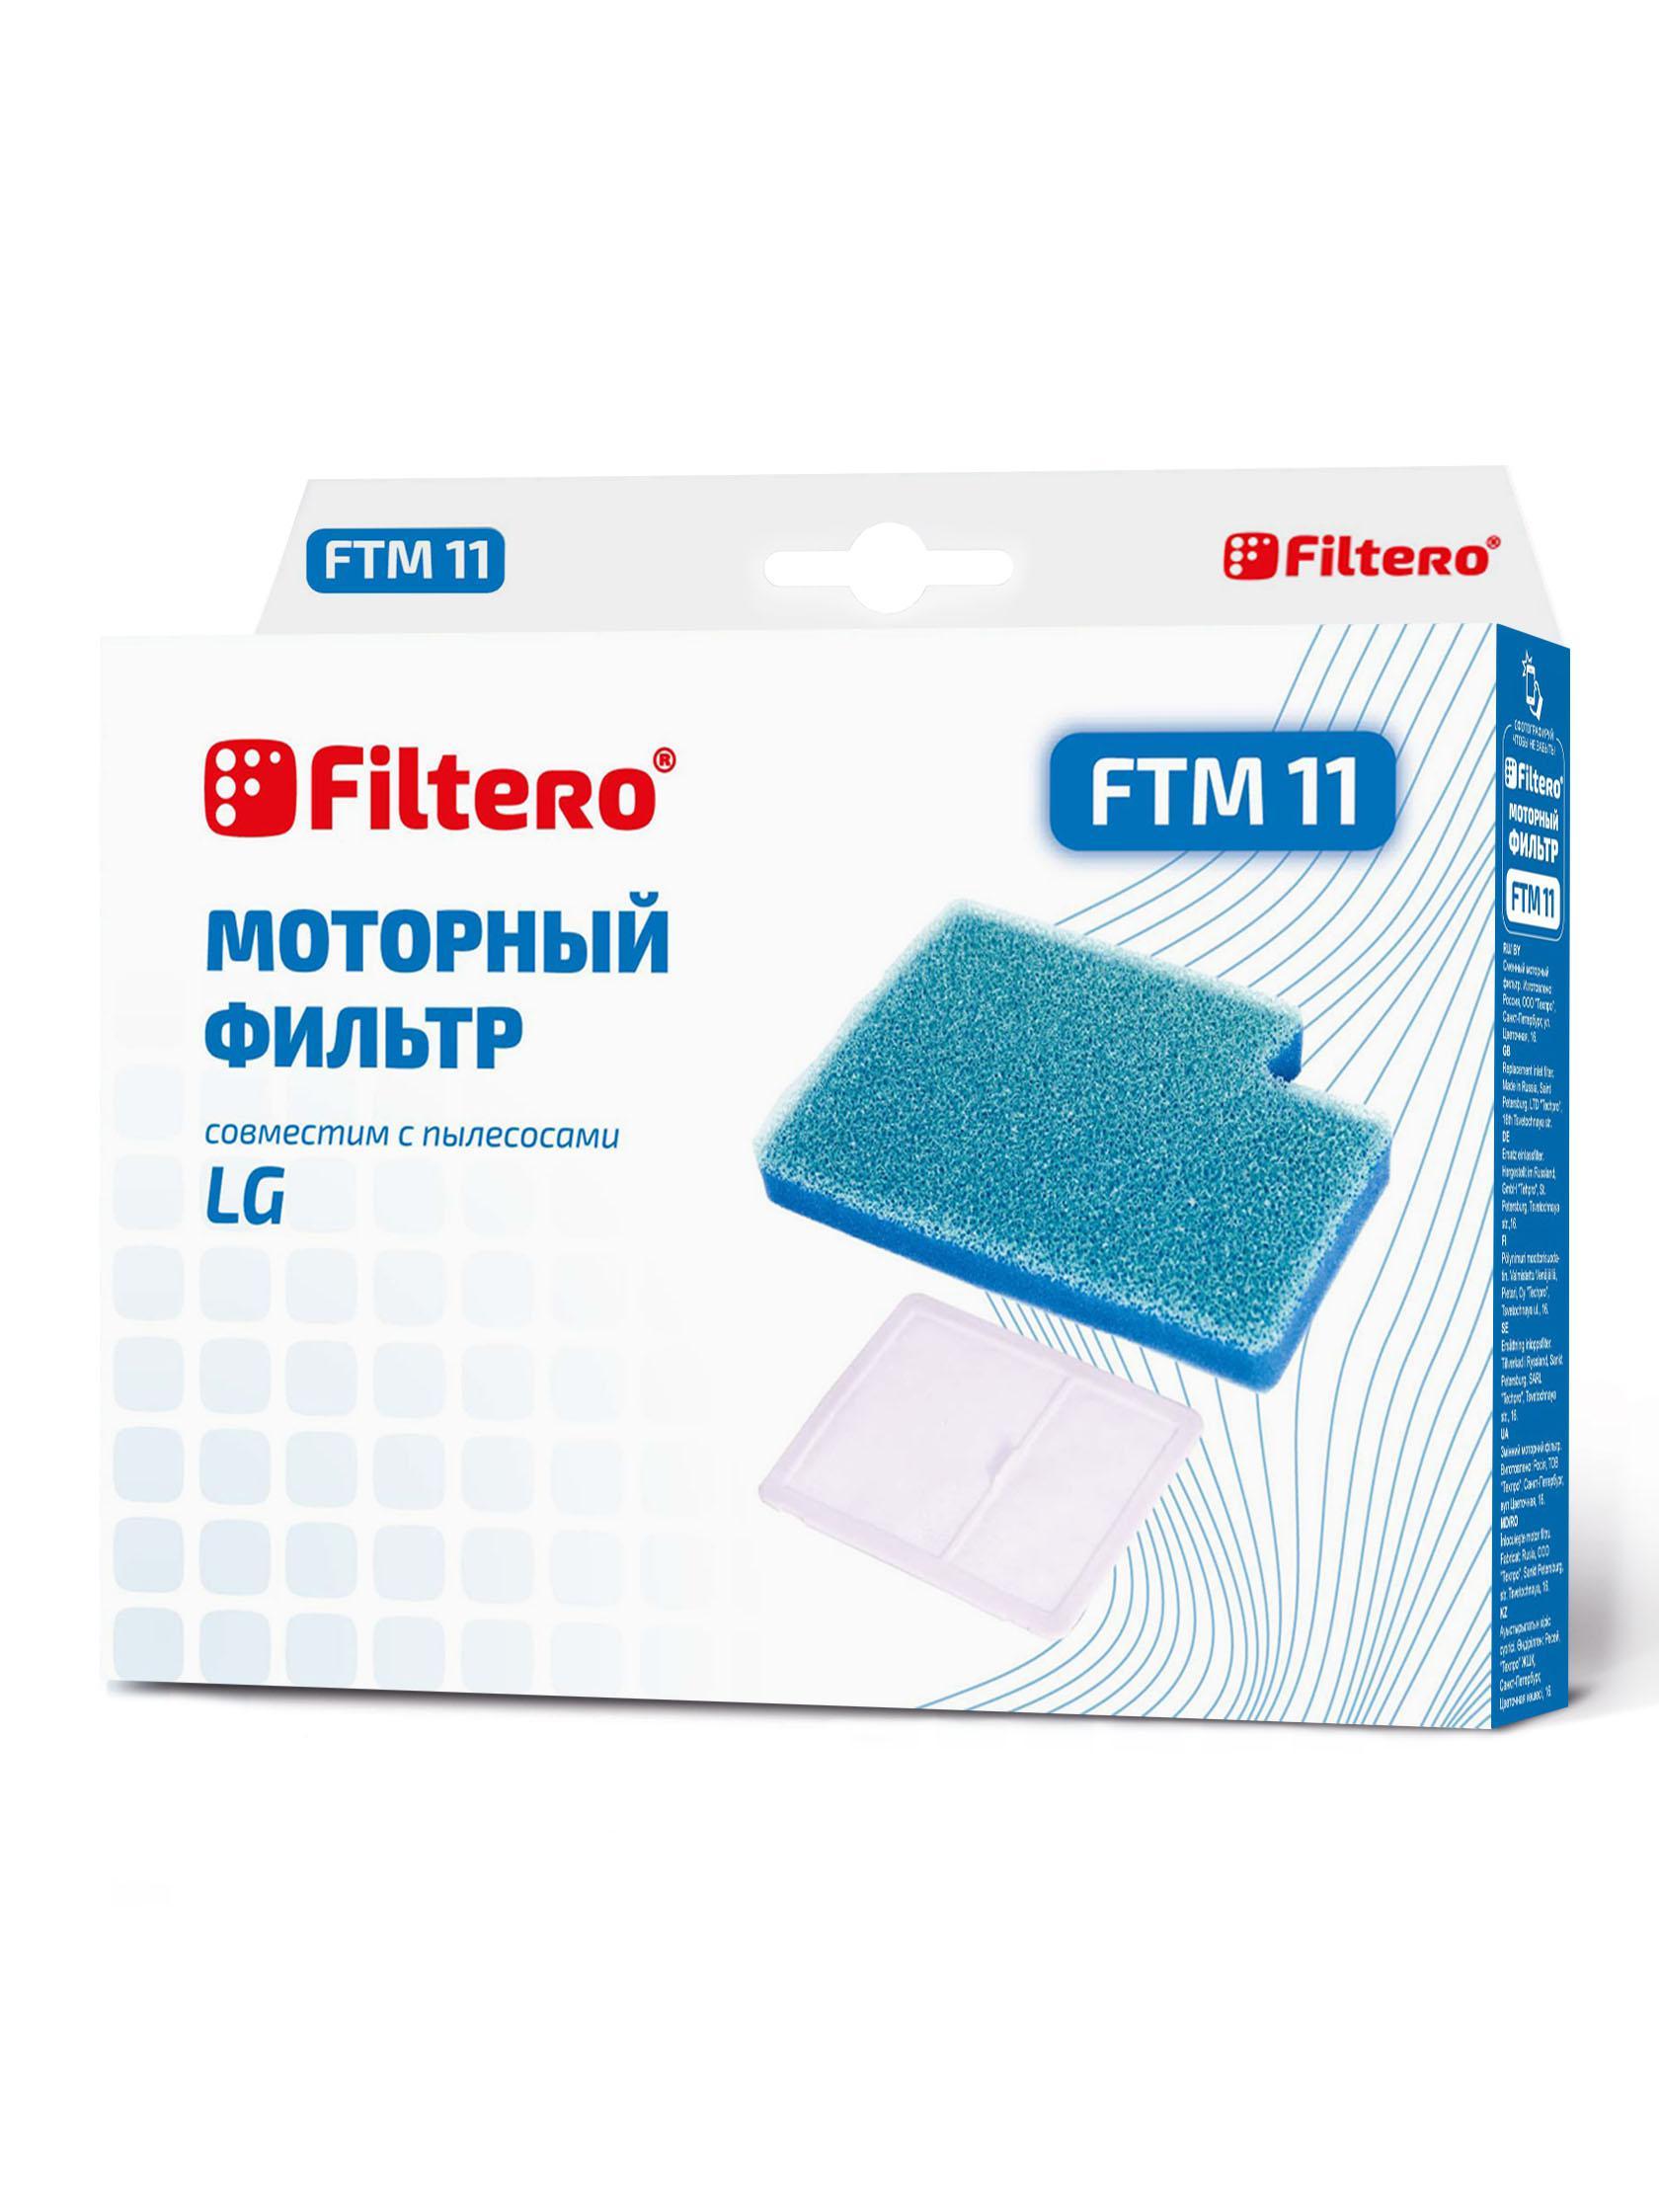 Набор Filtero Ftm 11 lge набор filtero ftm 11 lge